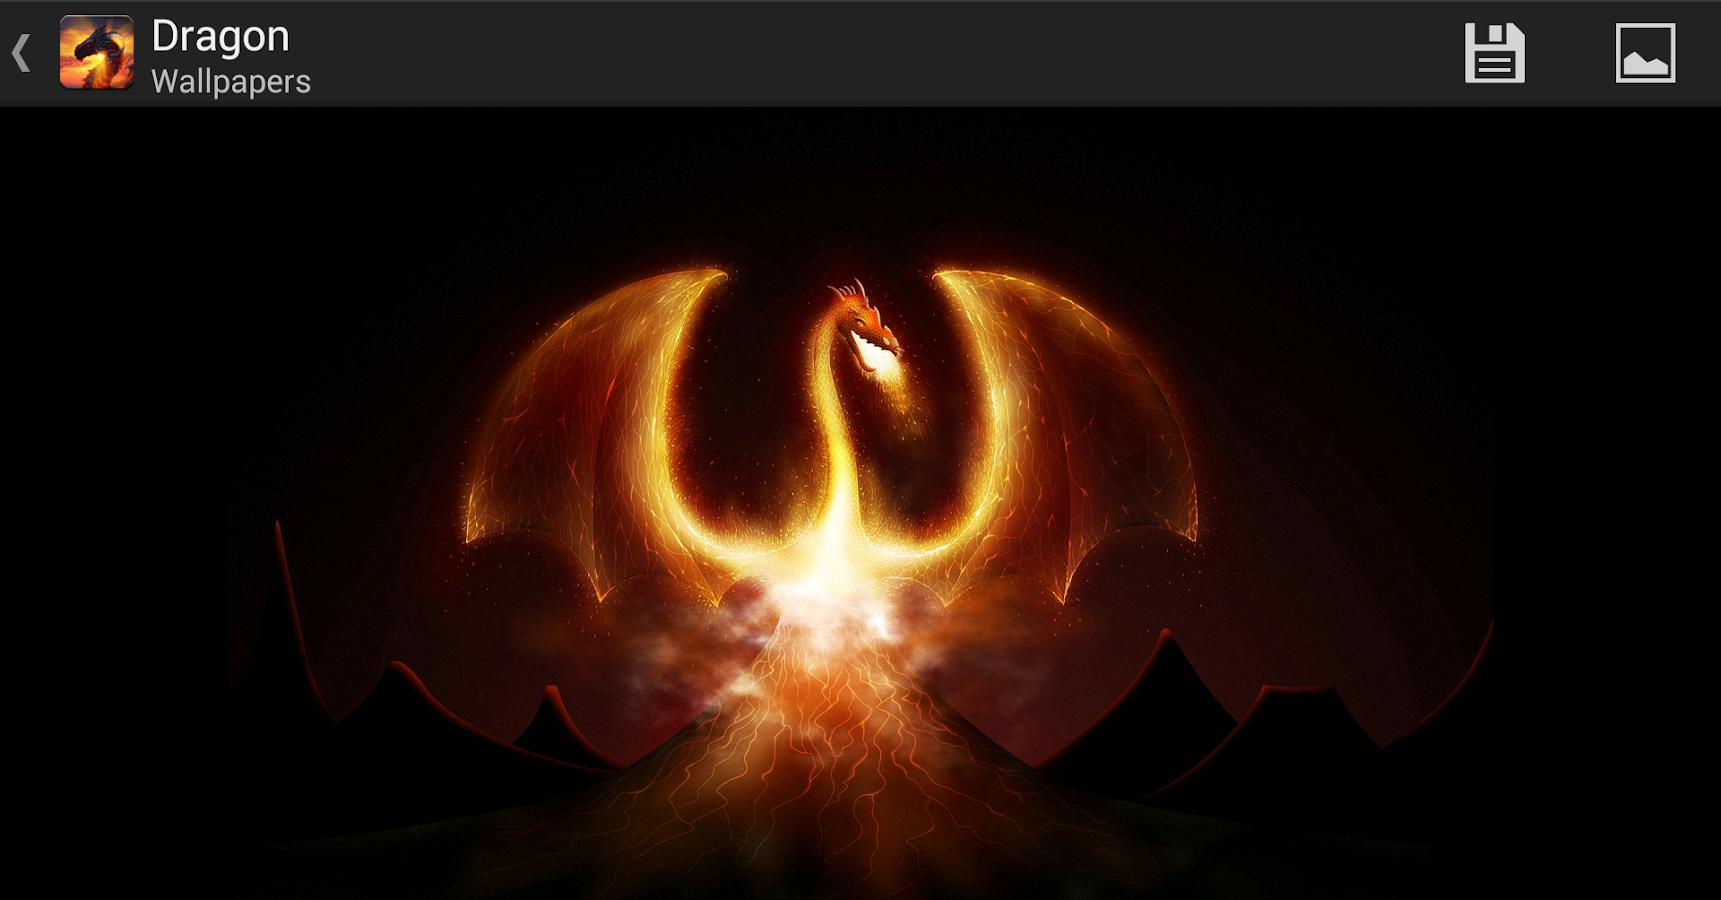 Hd wallpaper dragon - Fantasy Dragon Hd Wallpapers Screenshot